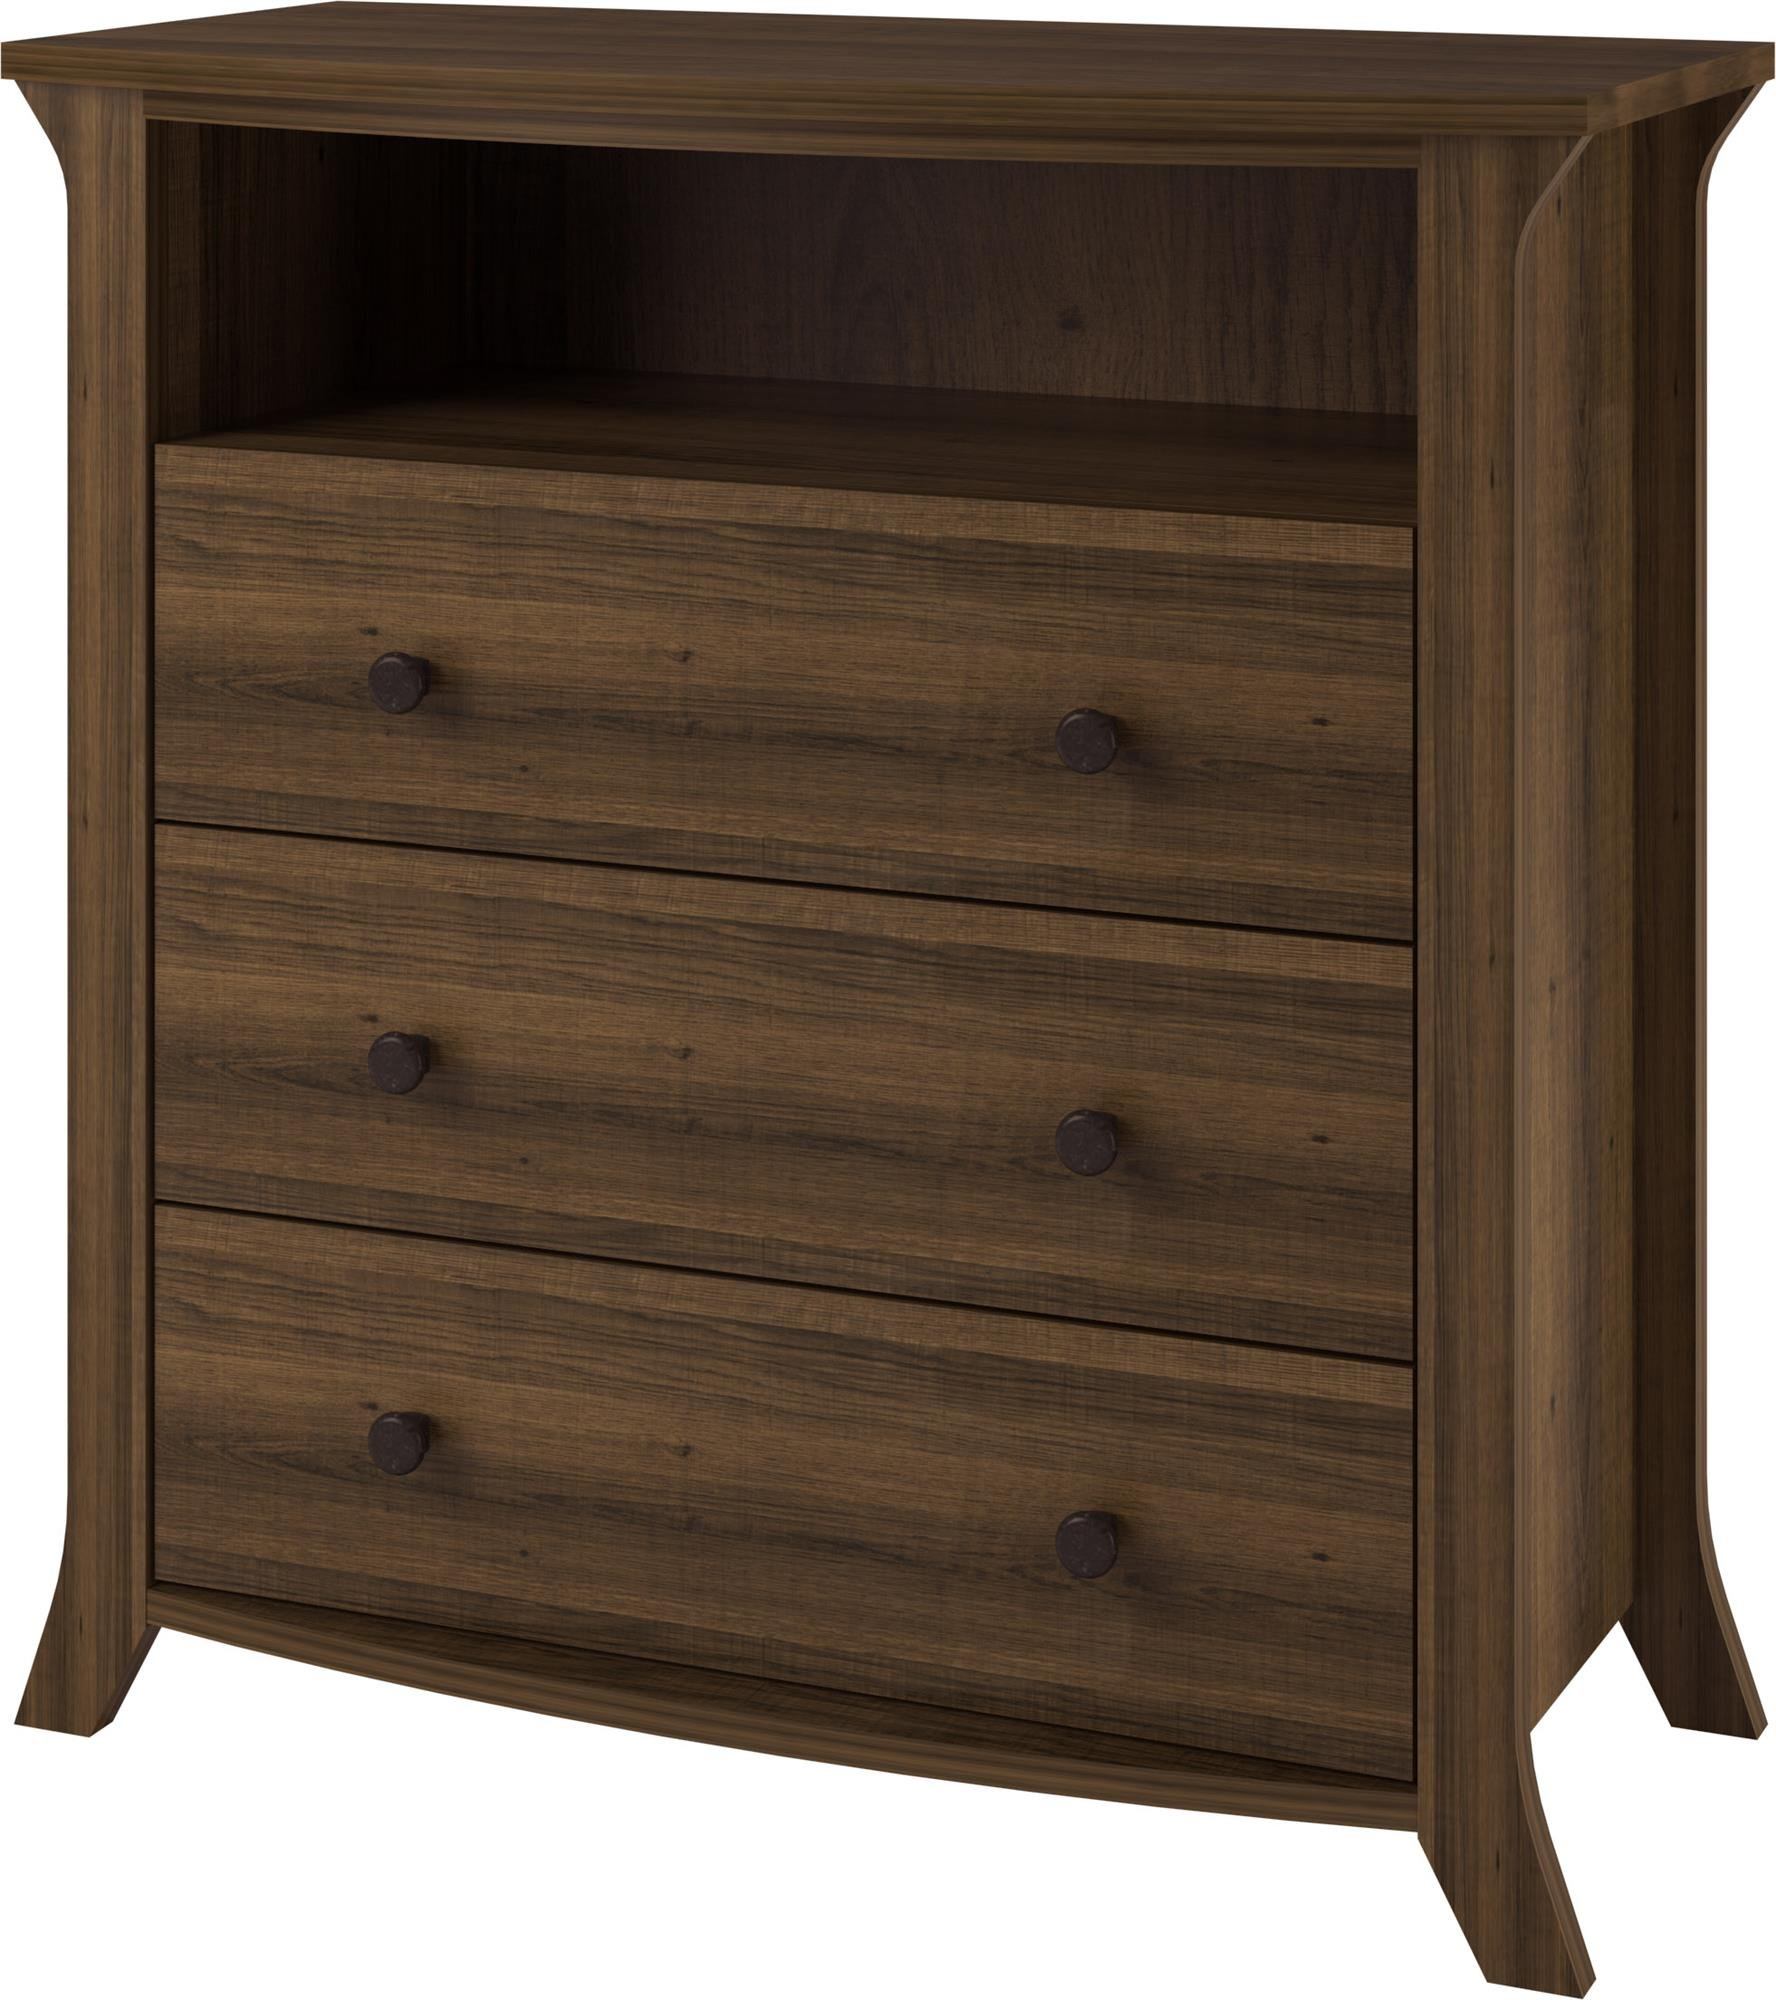 Ameriwood Home Oakridge 3 Drawer Media Dresser, Brown Oak